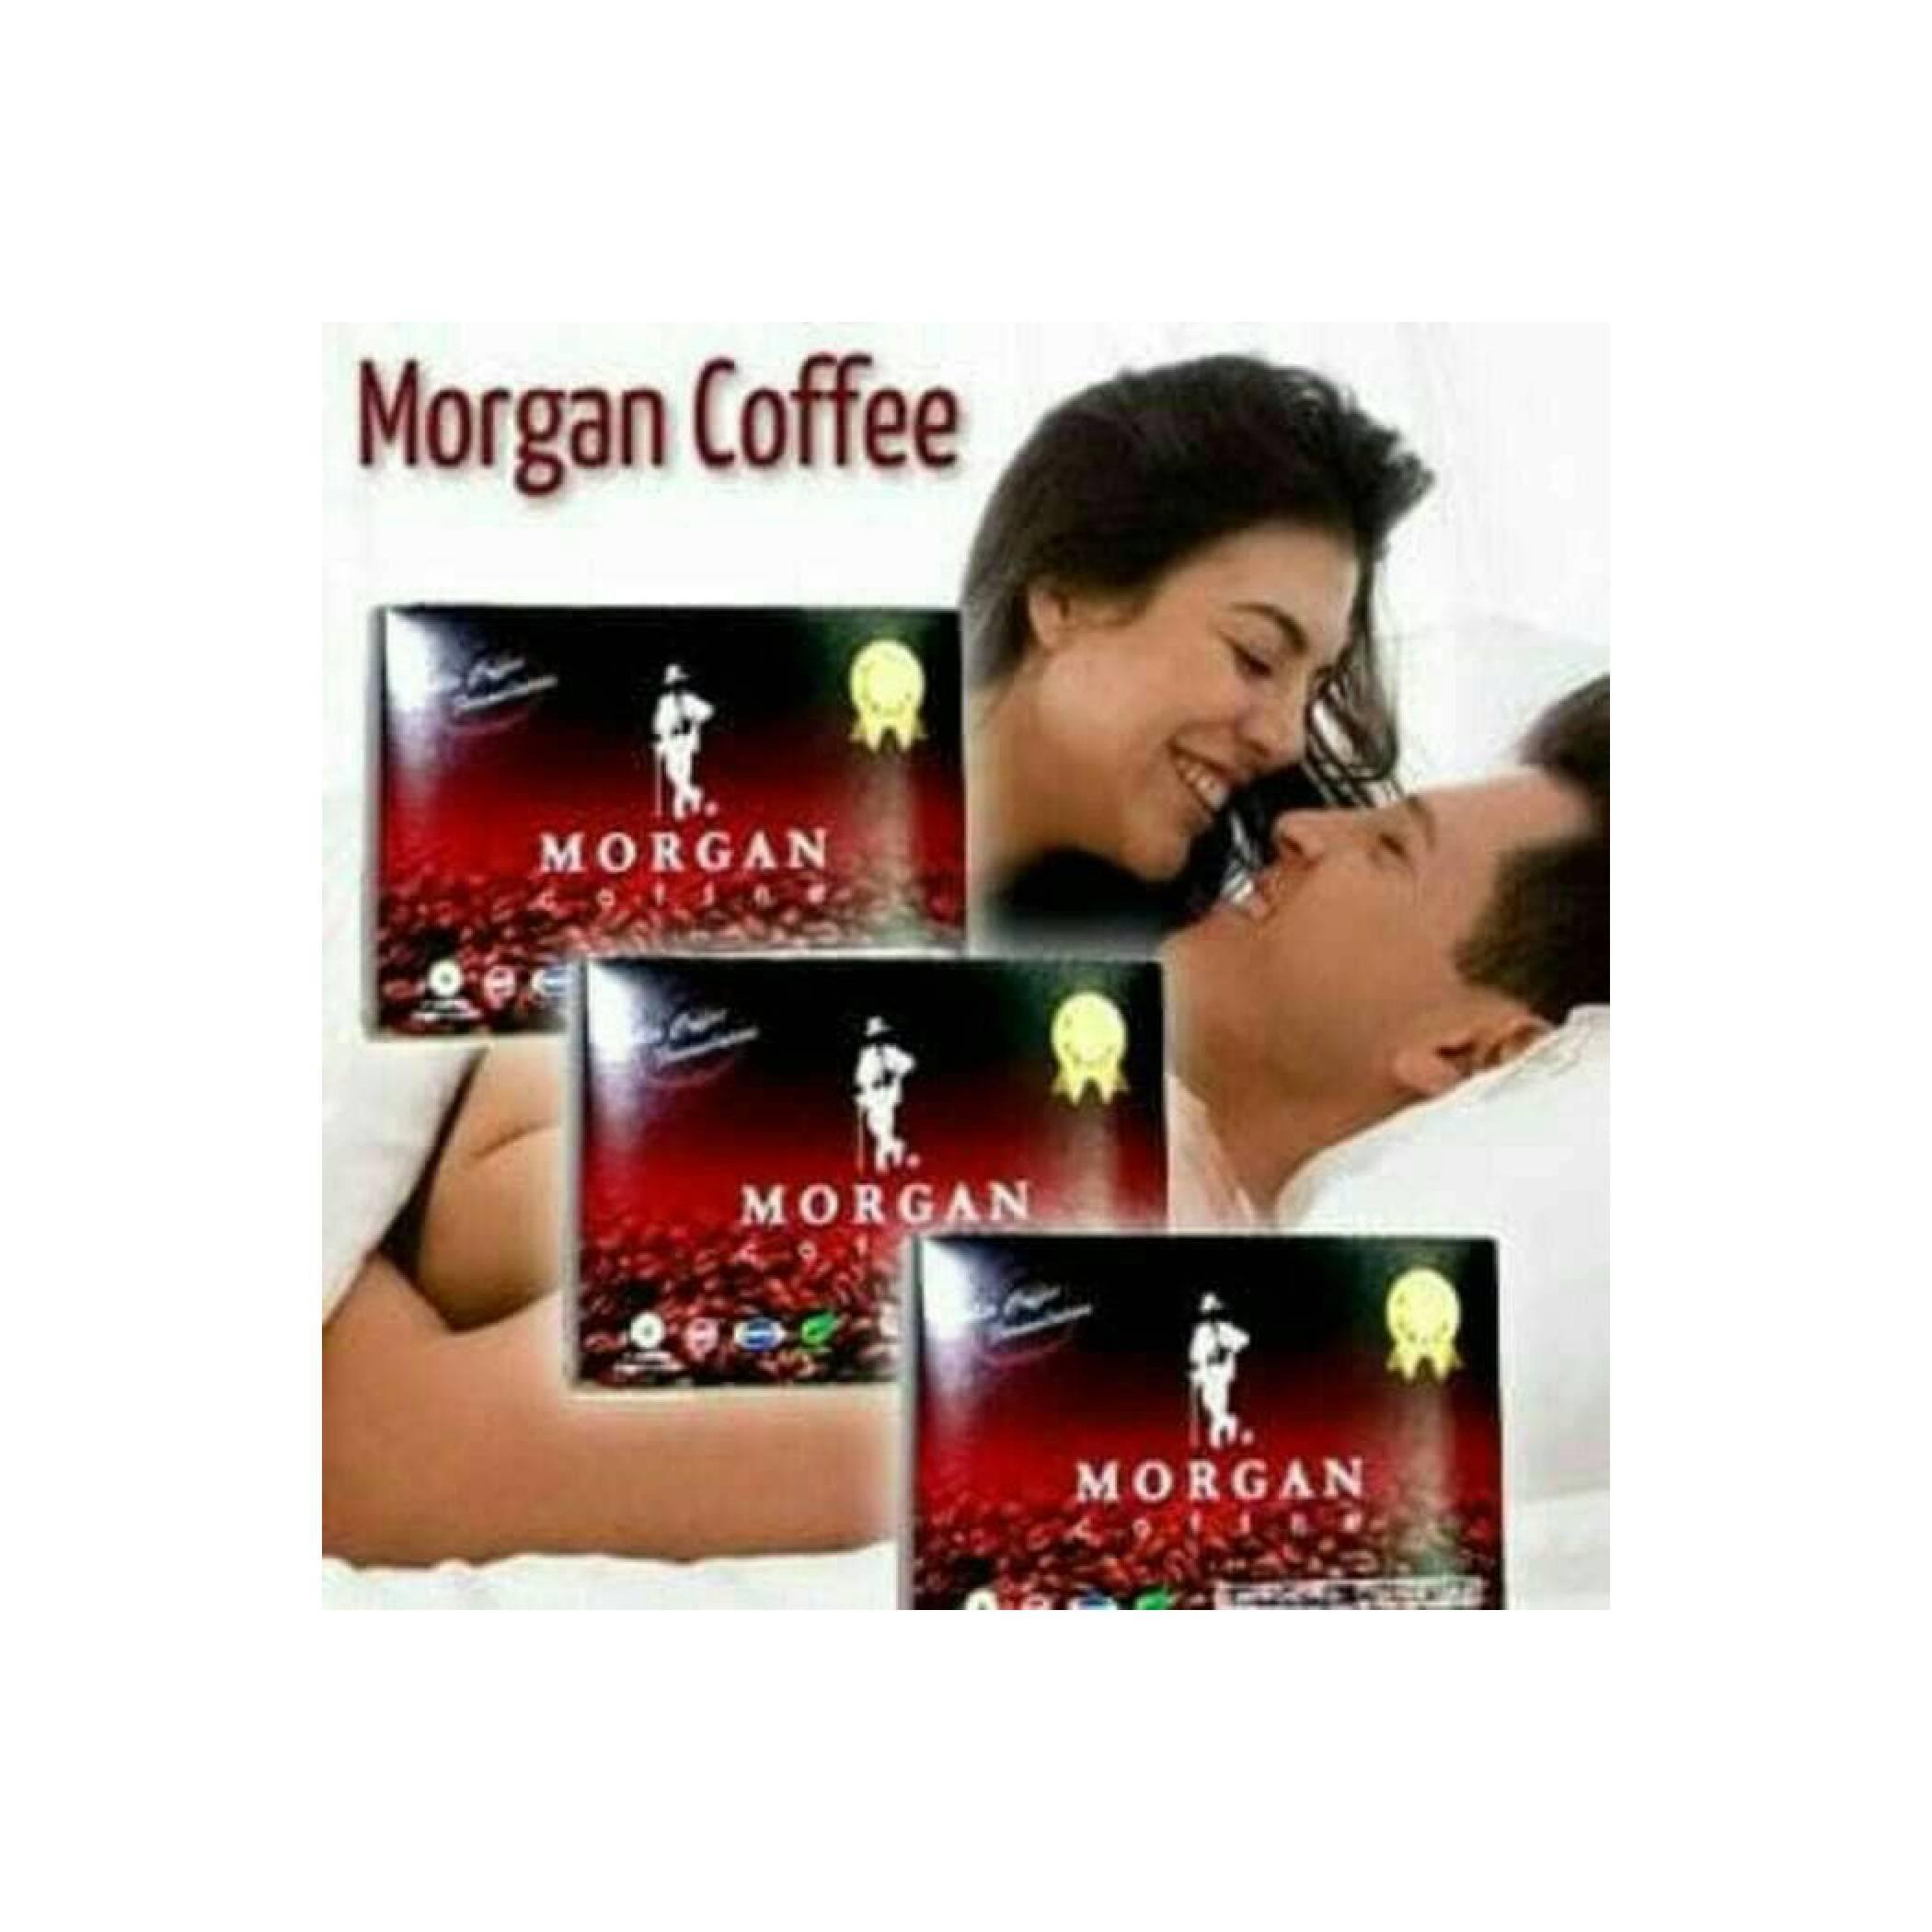 Jual Morgan Coffee Ginseng Murah Garansi Dan Berkualitas Id Store Kopi White Halalidr432000 Rp 432000